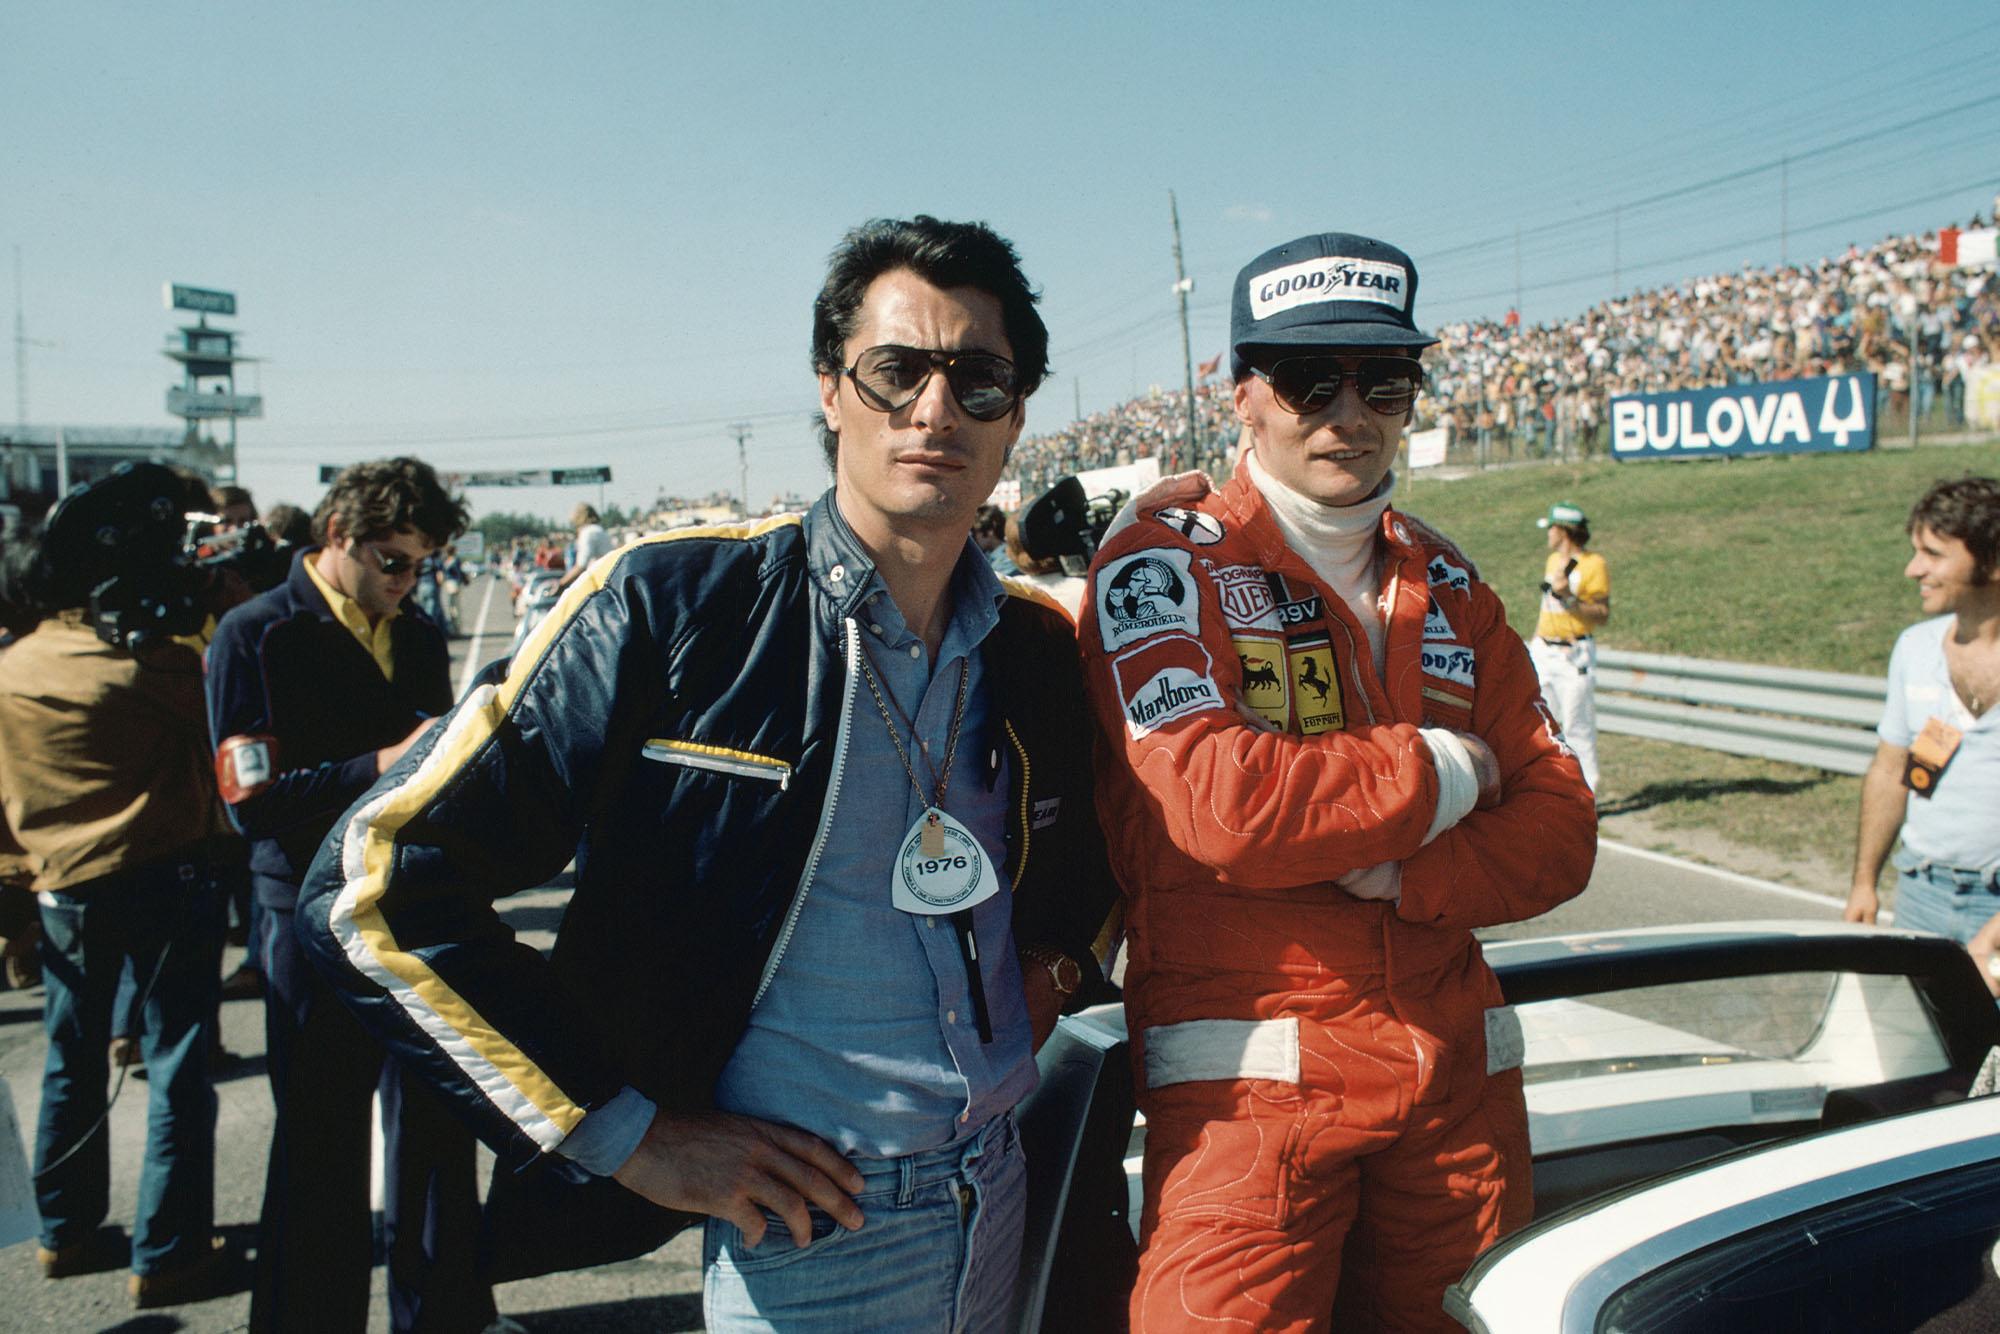 Niki Lauda (Ferrari) stands next to Scuderia team boss Daniele Audetto.